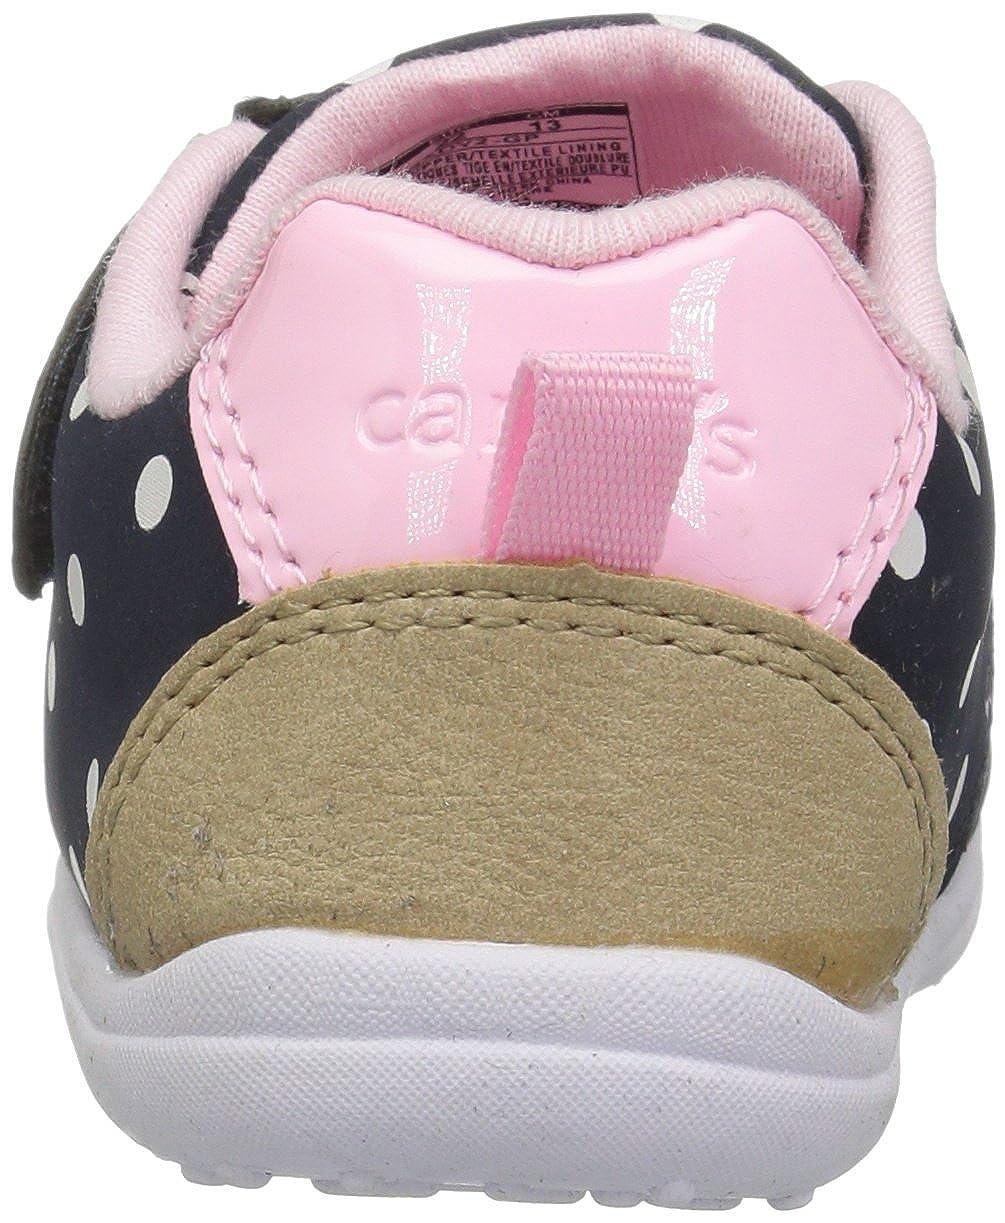 Carters Every Step Kids Brady Baby Boys Casual Sneaker